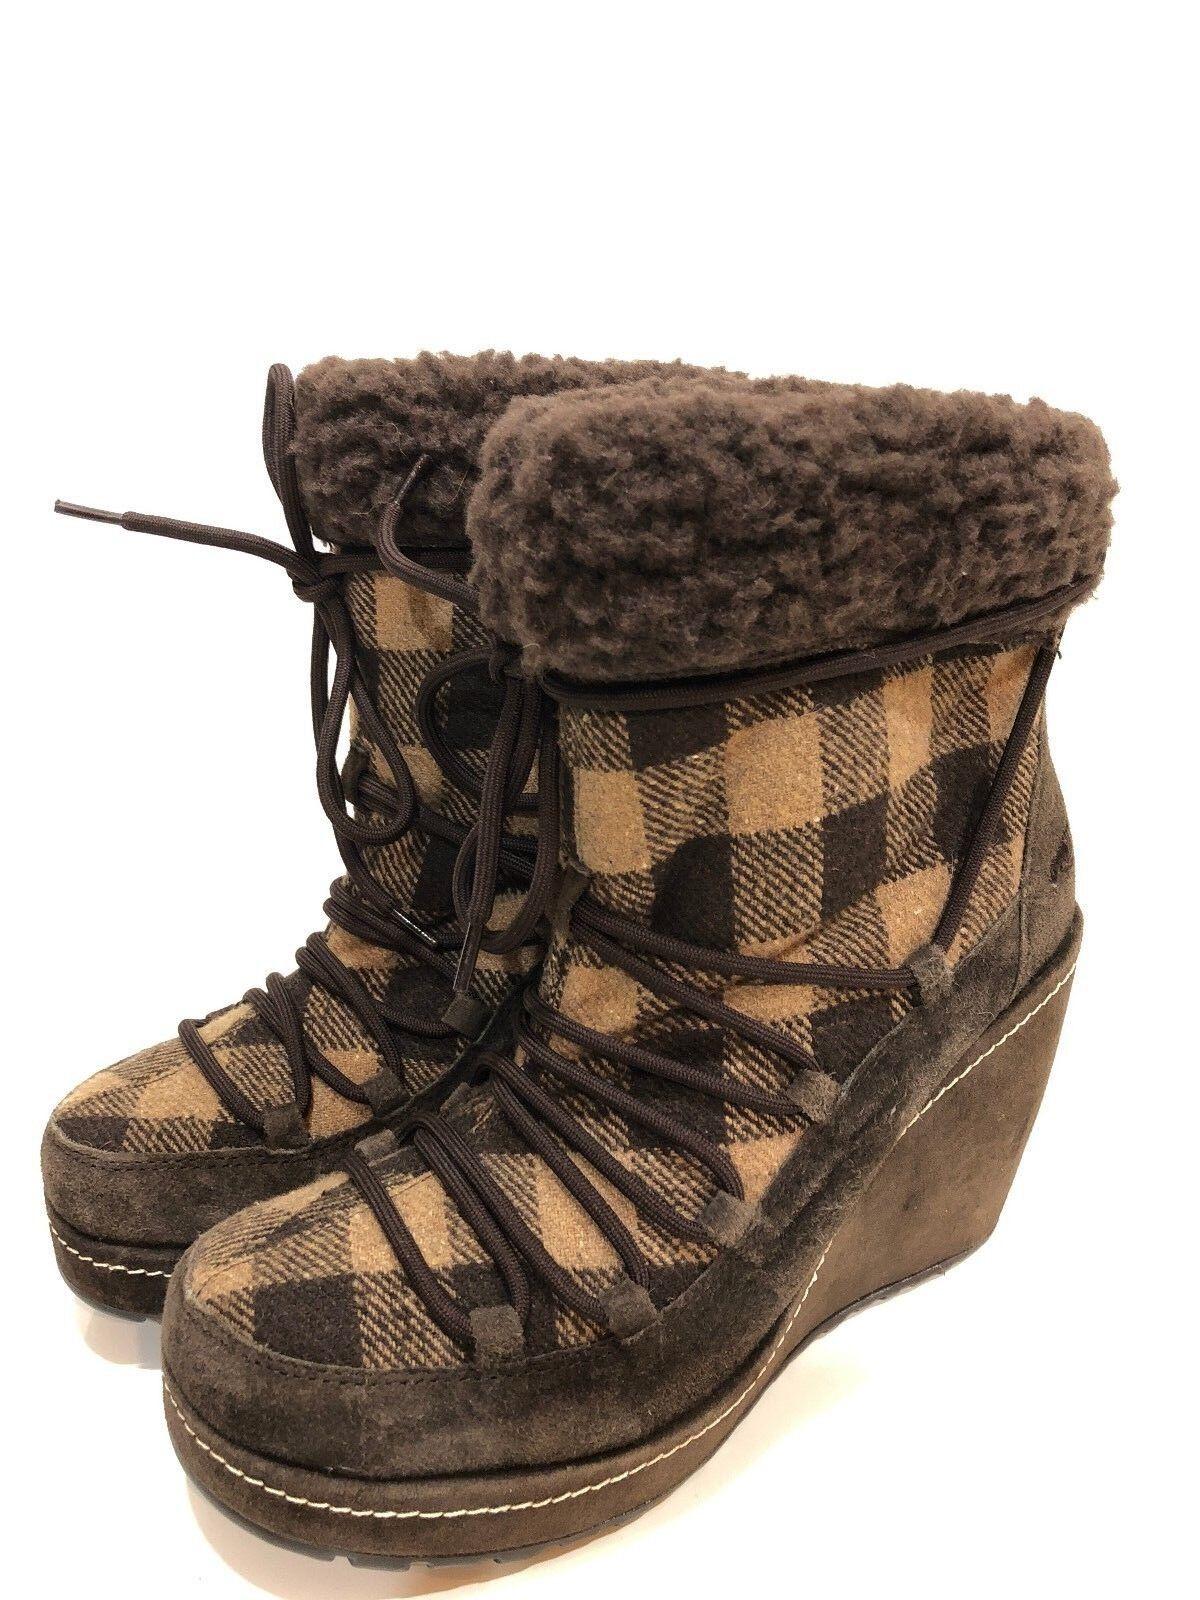 Rocket Dog Women's Winter Boots Size 10 M